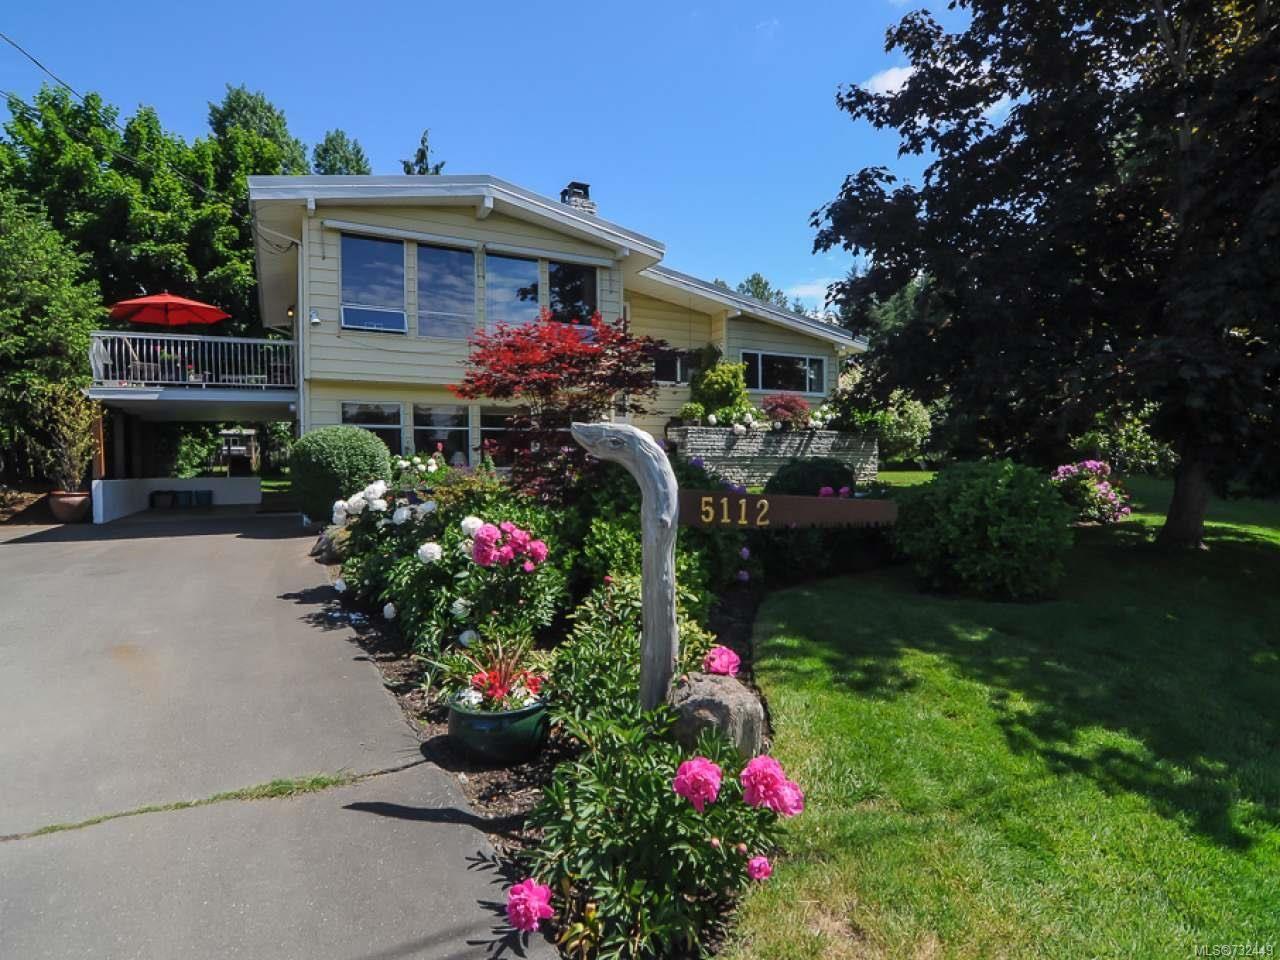 Main Photo: 5112 Veronica Pl in COURTENAY: CV Courtenay North House for sale (Comox Valley)  : MLS®# 732449